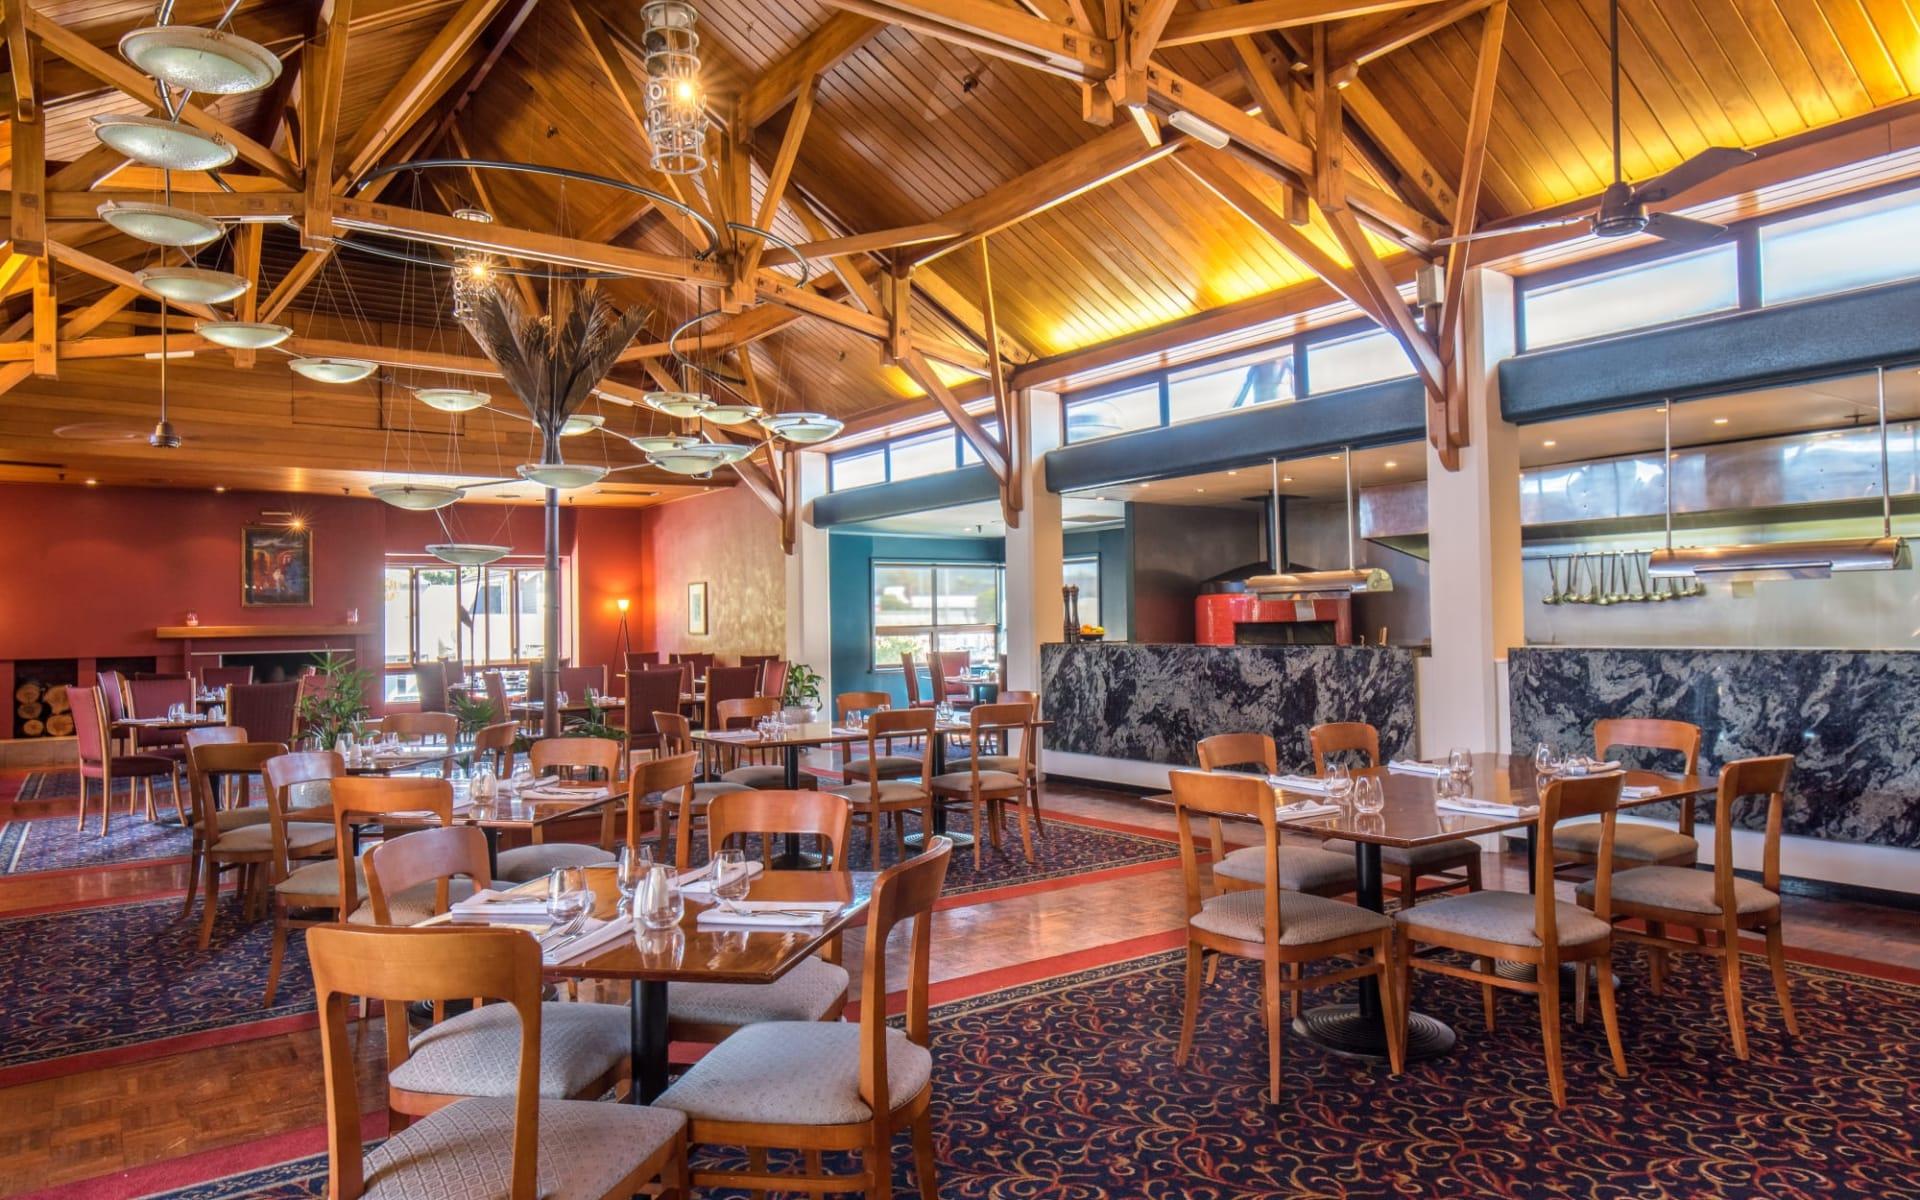 Millennium Hotel Rotorua:  Hi_13528_95125387_V_Nikau_Restaurant_4